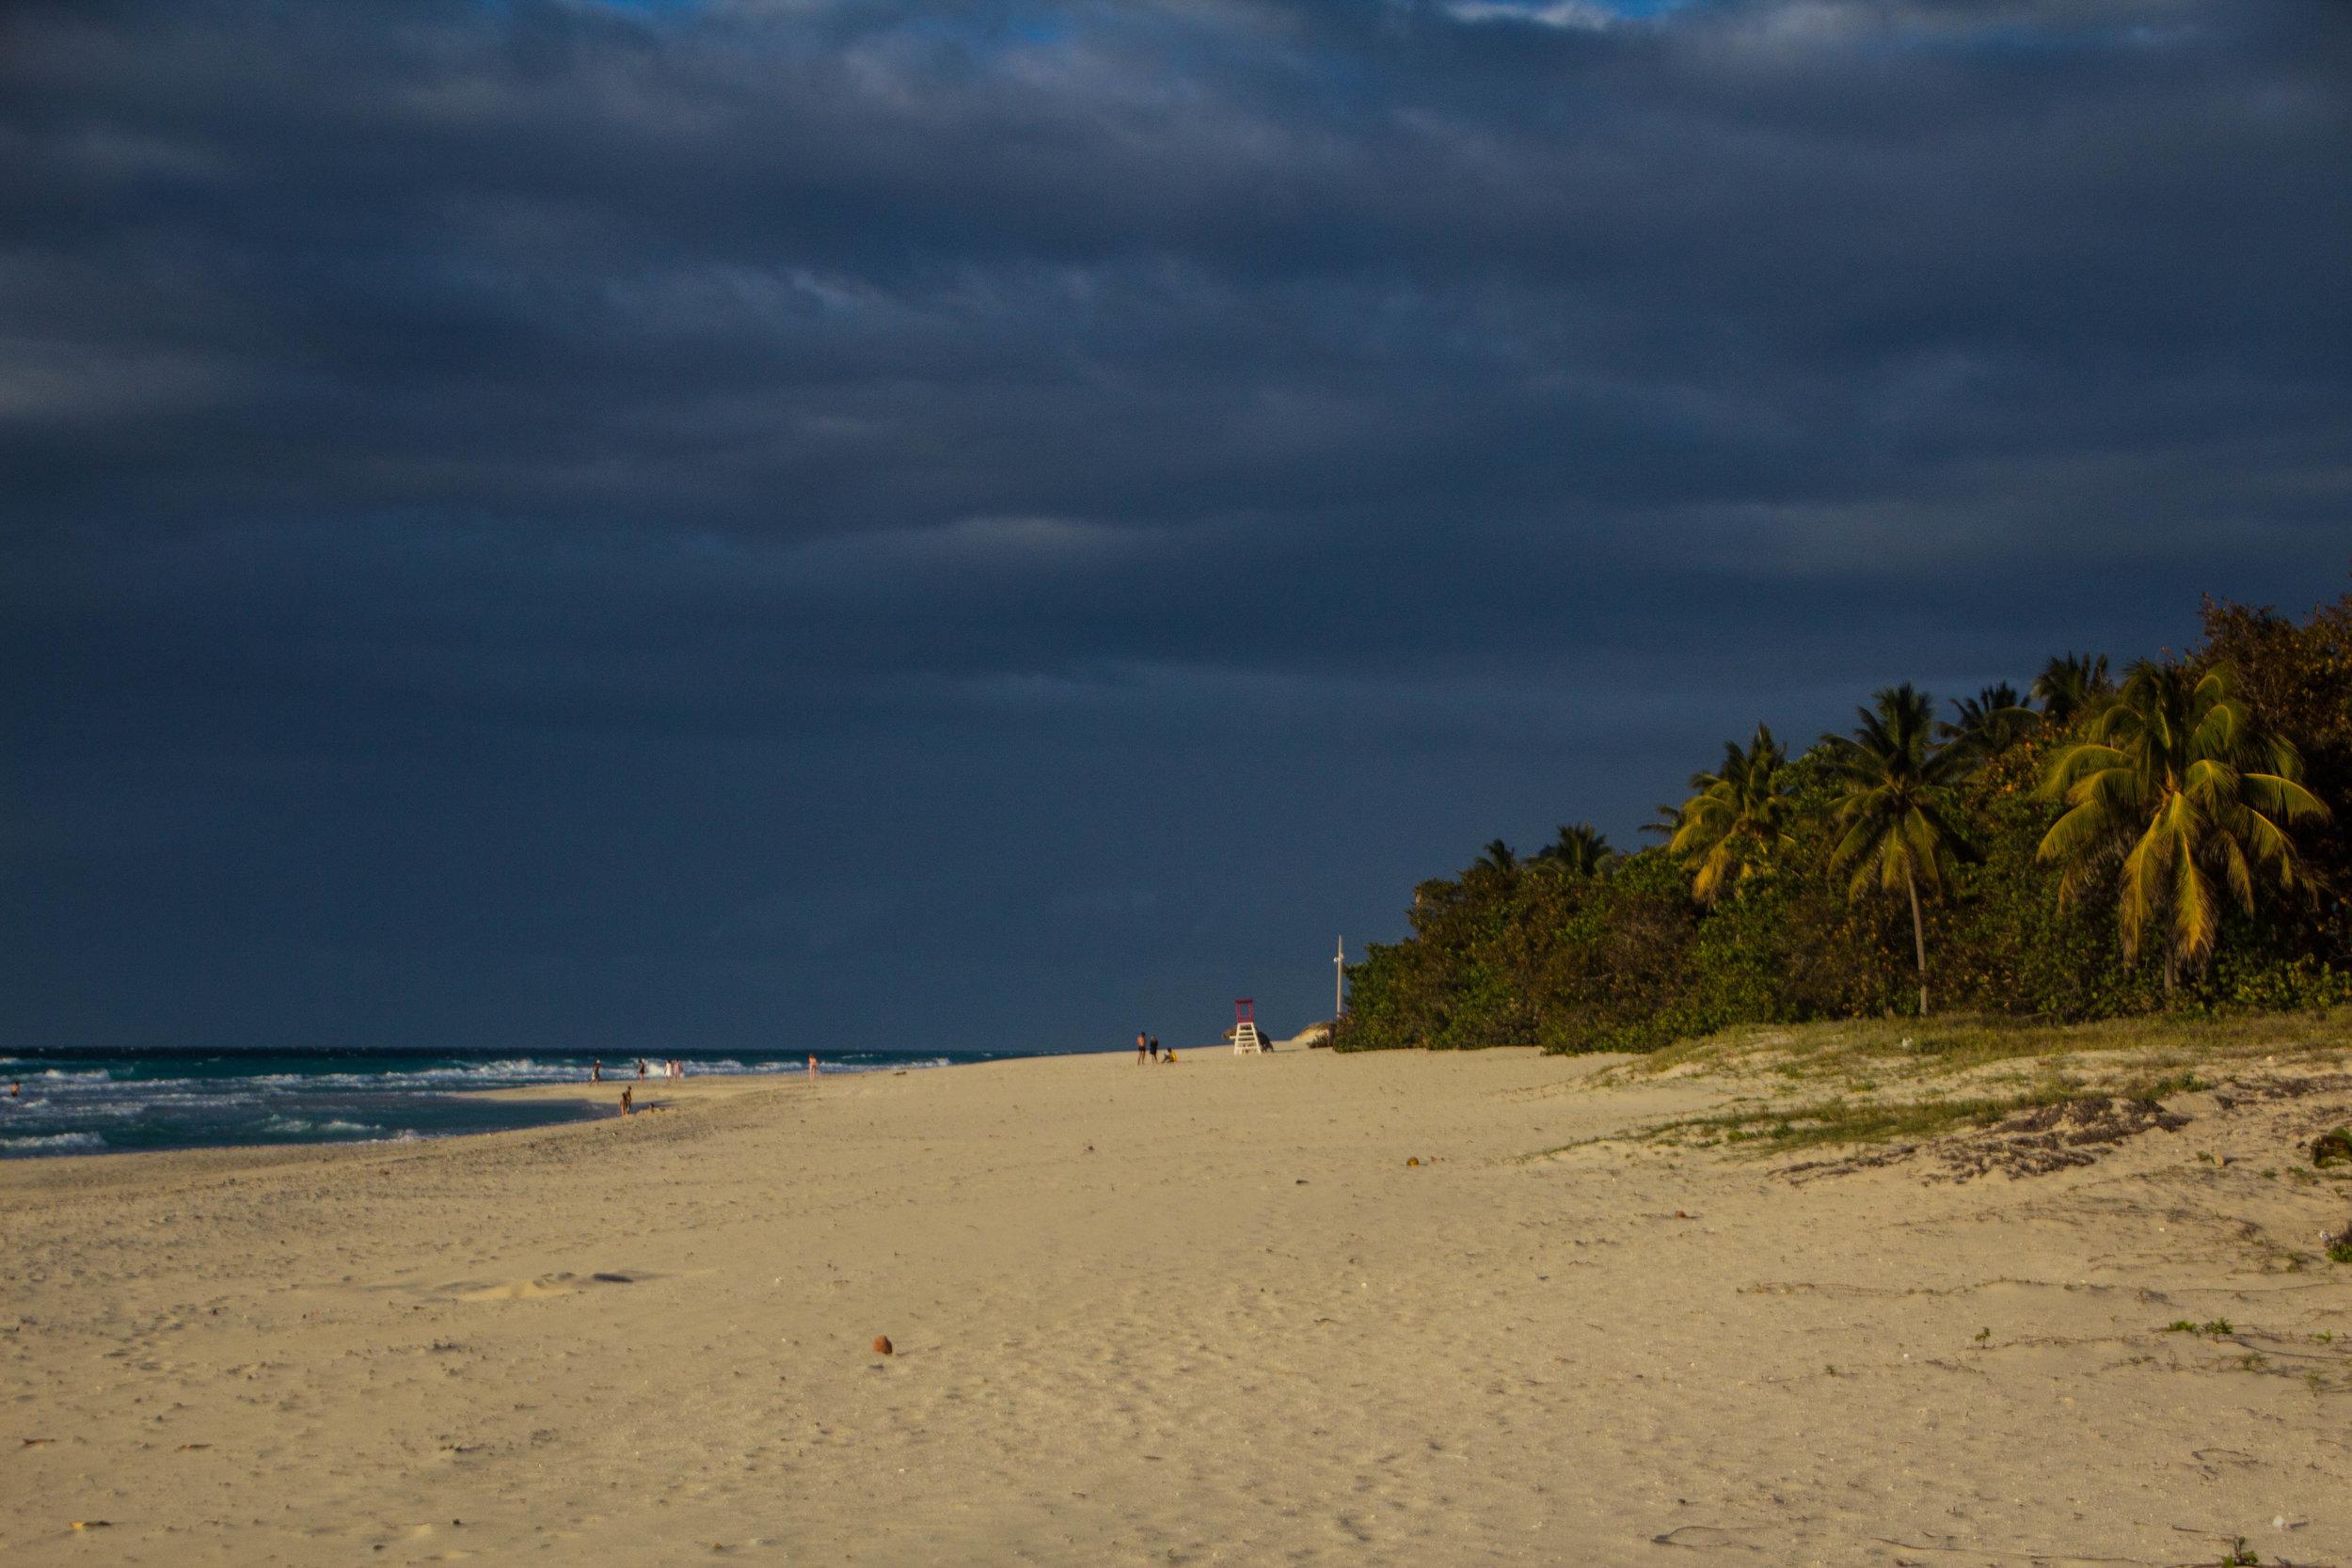 beaches varadero cuba sunset-1-2-2.jpg